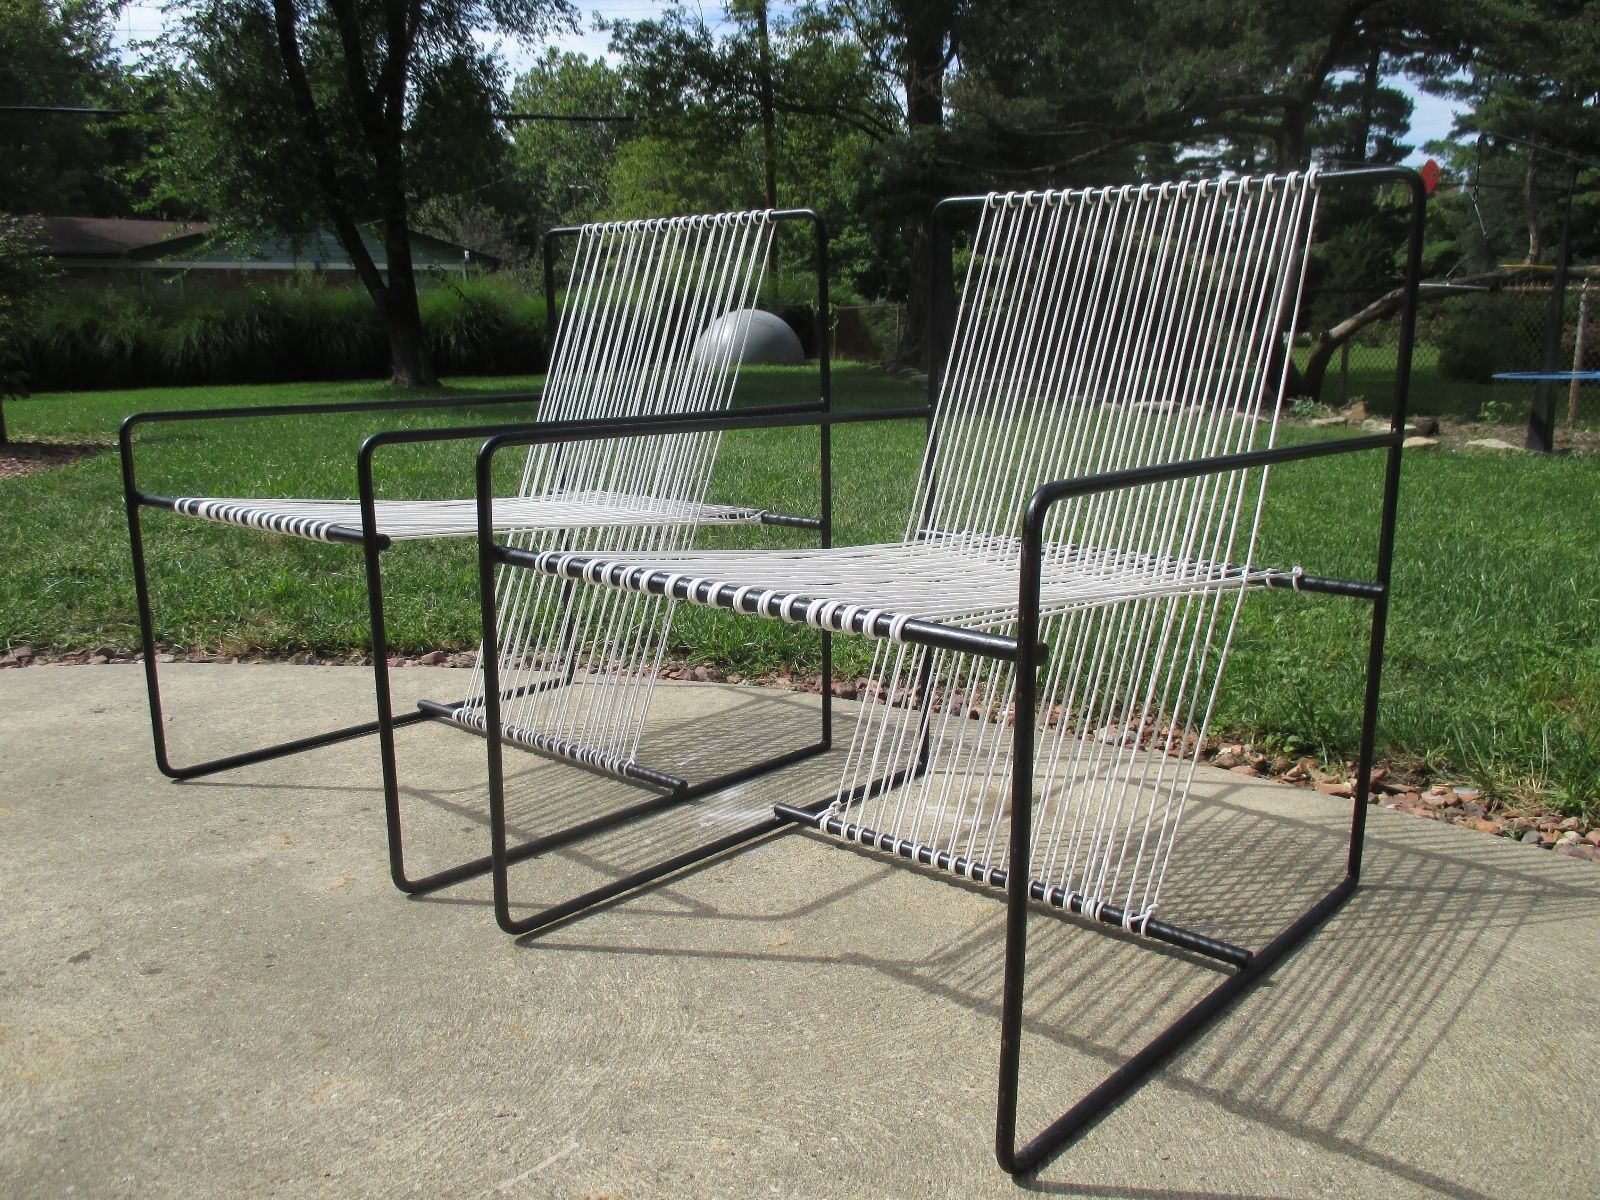 Mid Century Patio Modern Design Vintage Chairs van keppel green